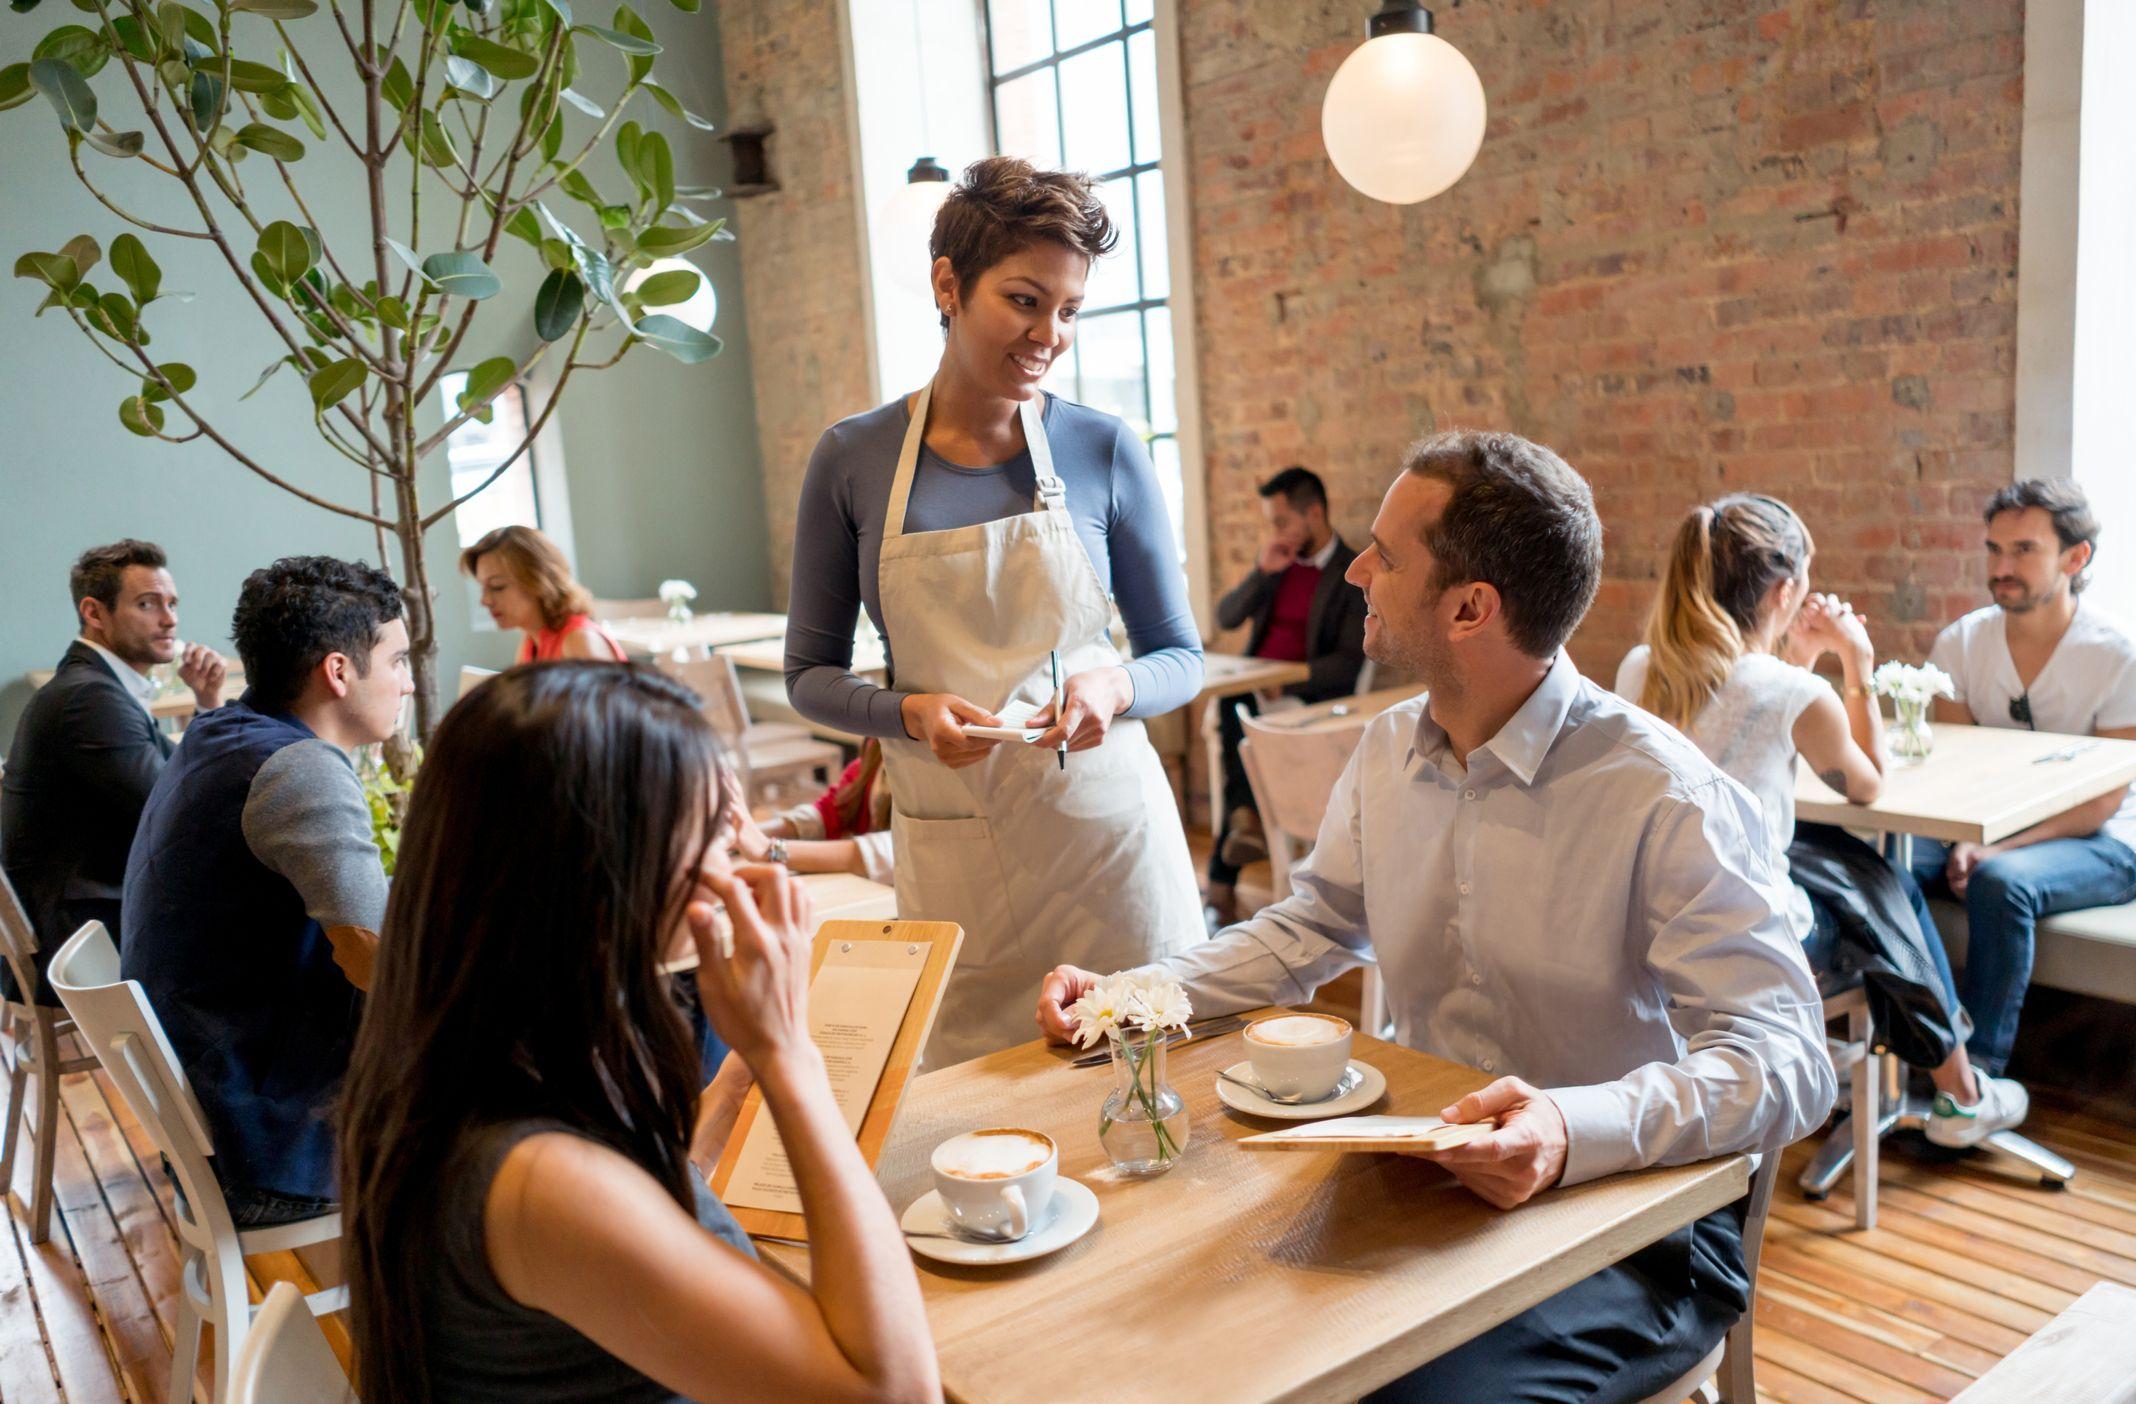 Waitress serving a couple at a restaurant